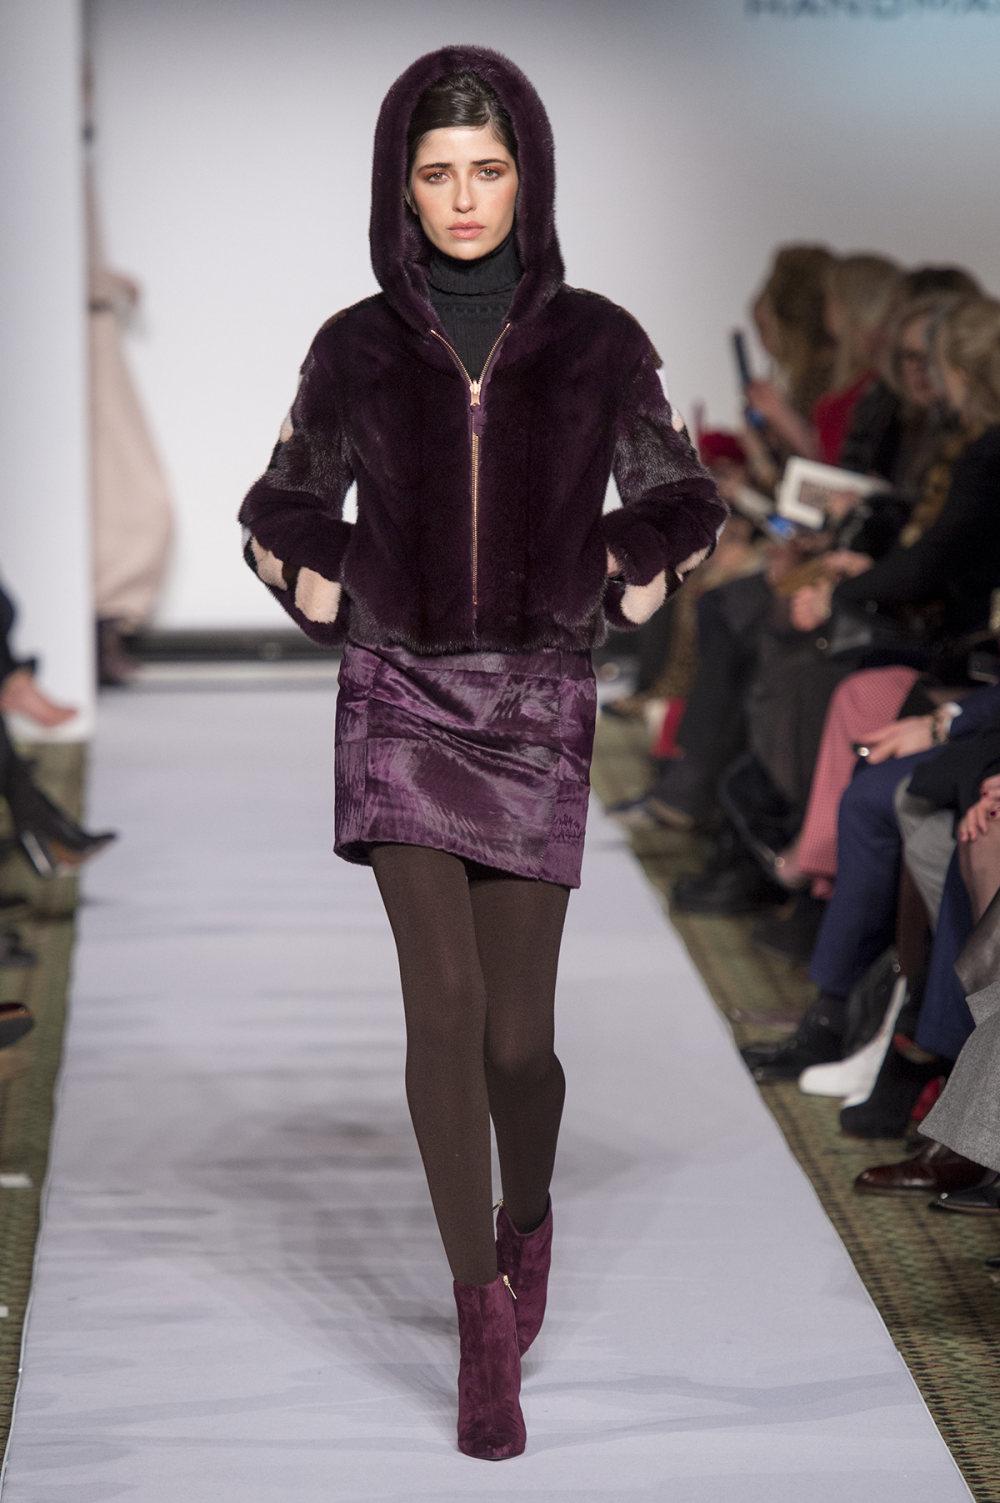 Carolina Herrera时装系列用鲜艳的颜色充满智能的黑白色调-34.jpg